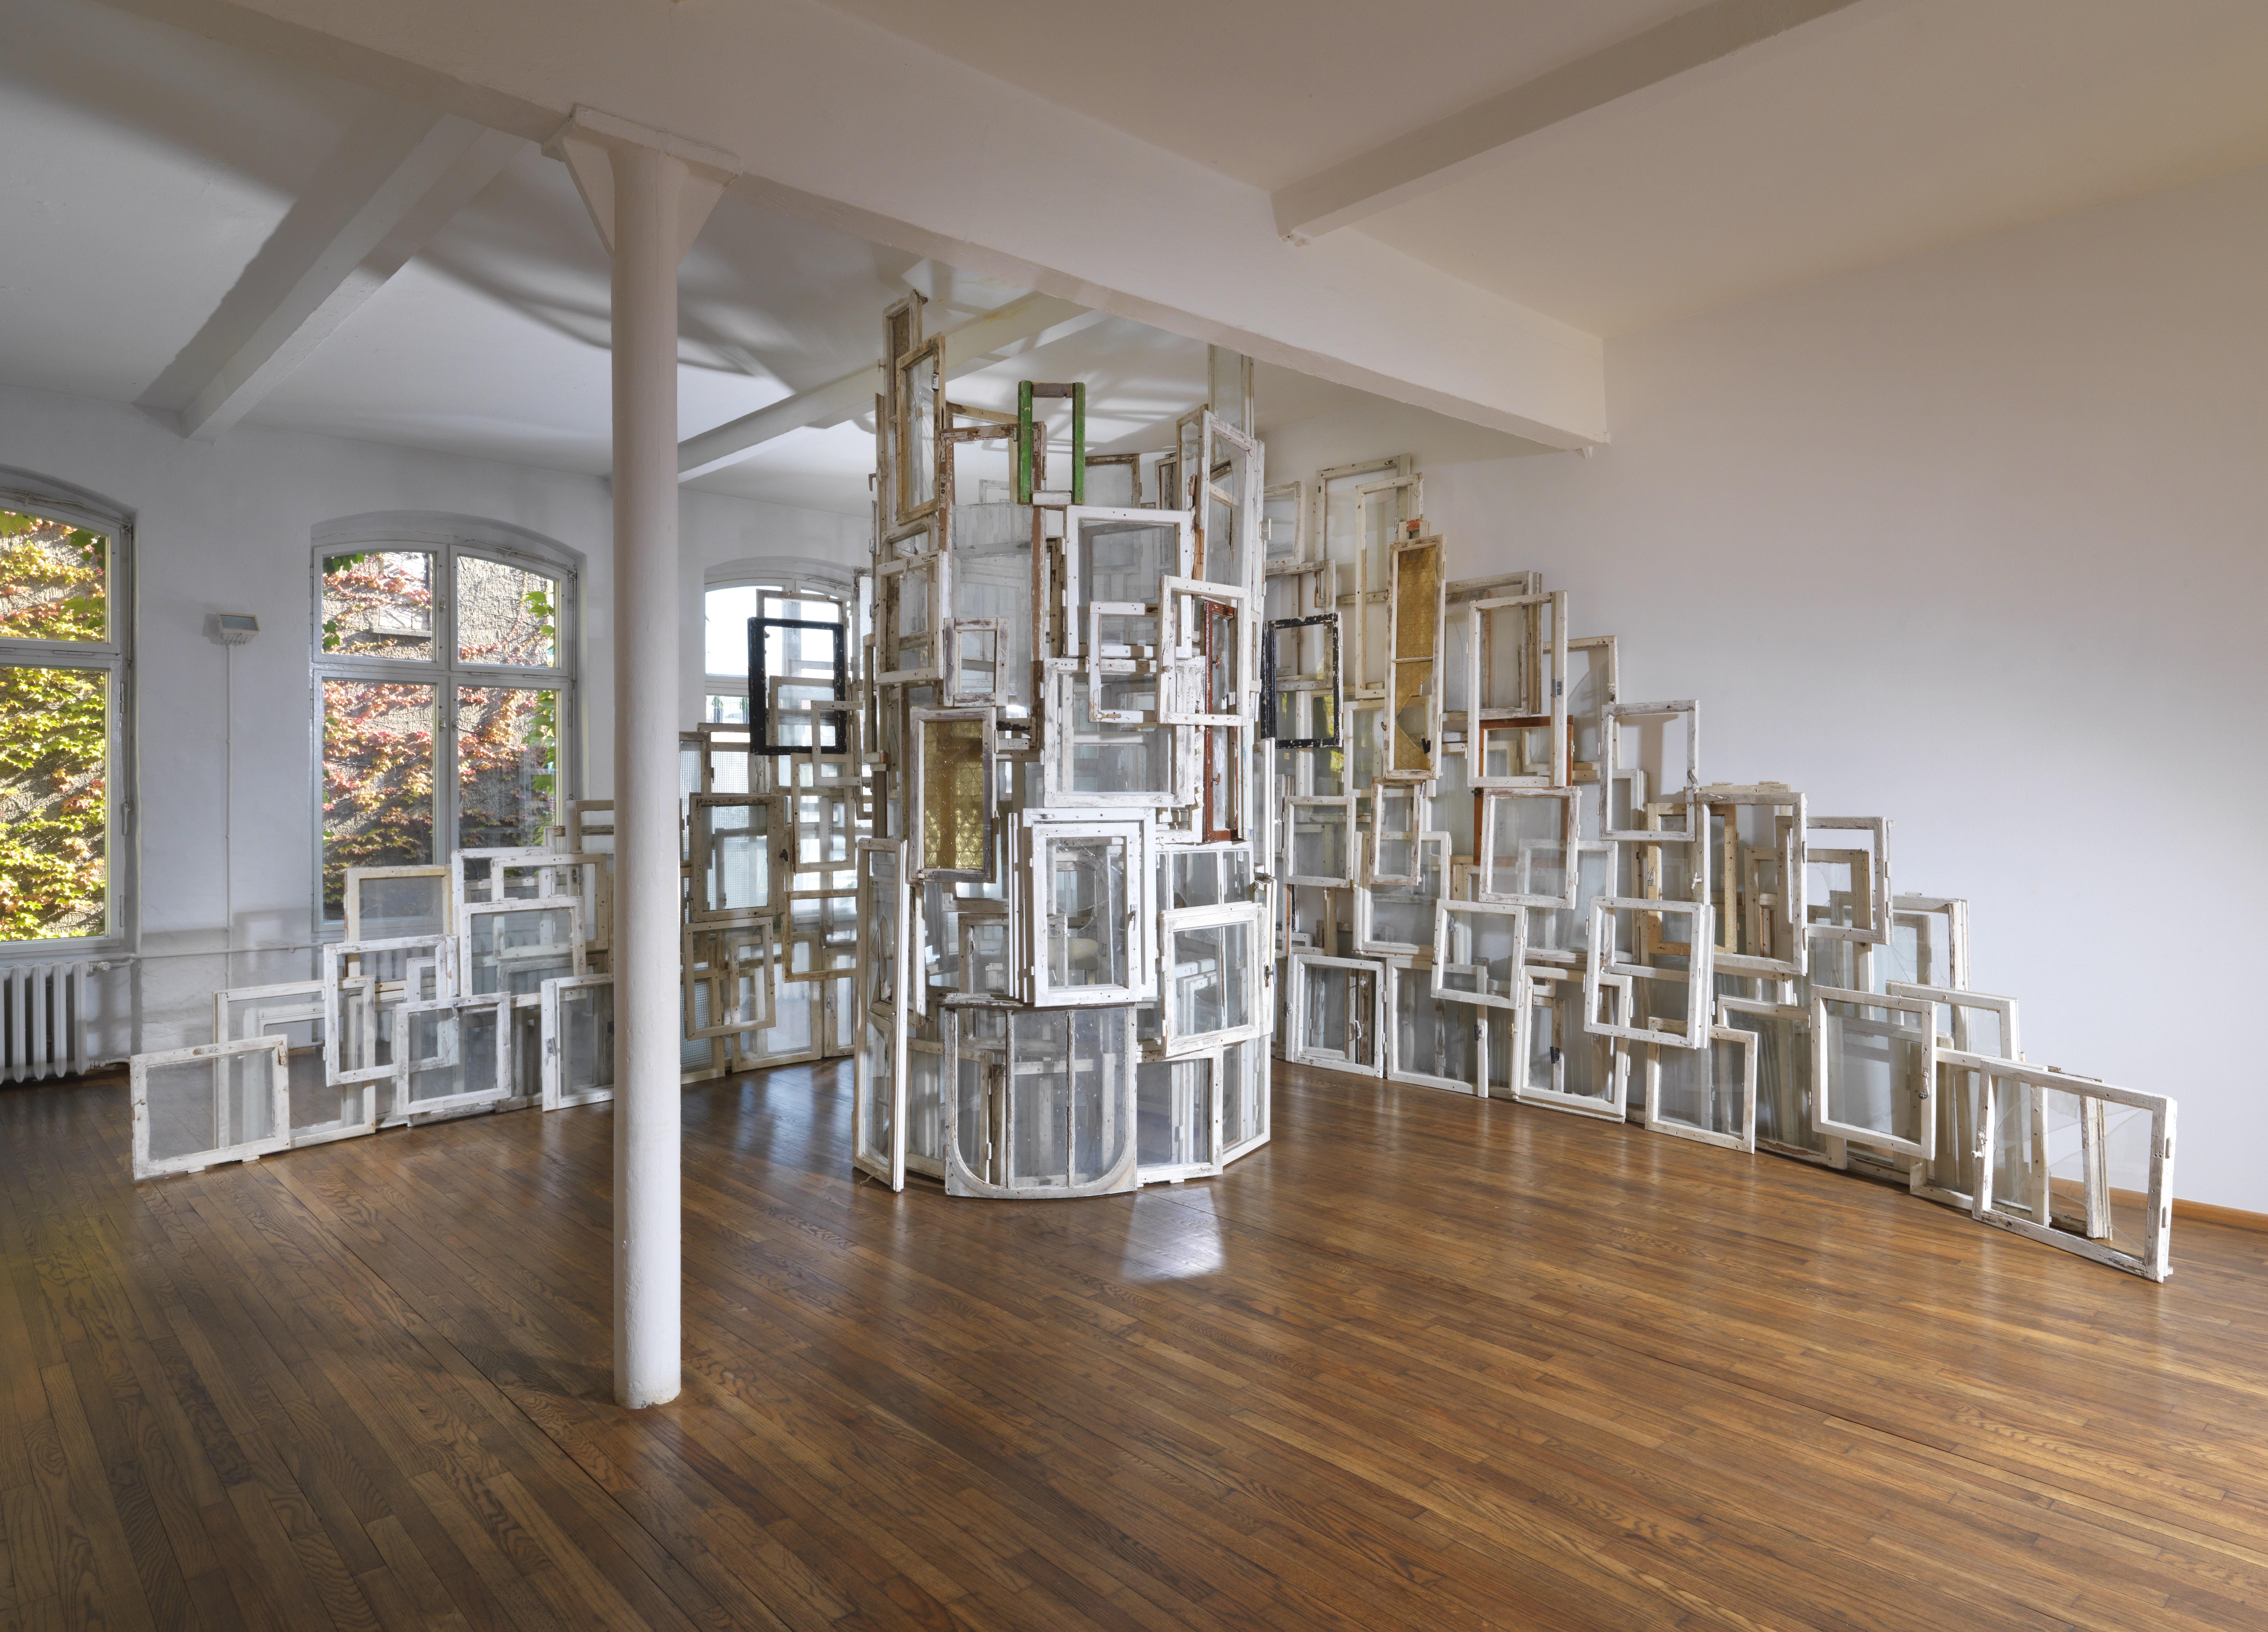 Image: Chiharu Shiota, Inside-Outside, 2009. ca. 280 windows, 1 chair, dimensions vary with installation. Courtesy Sammlung Hoffmann, Berlin. Photo: Jens Ziehe.